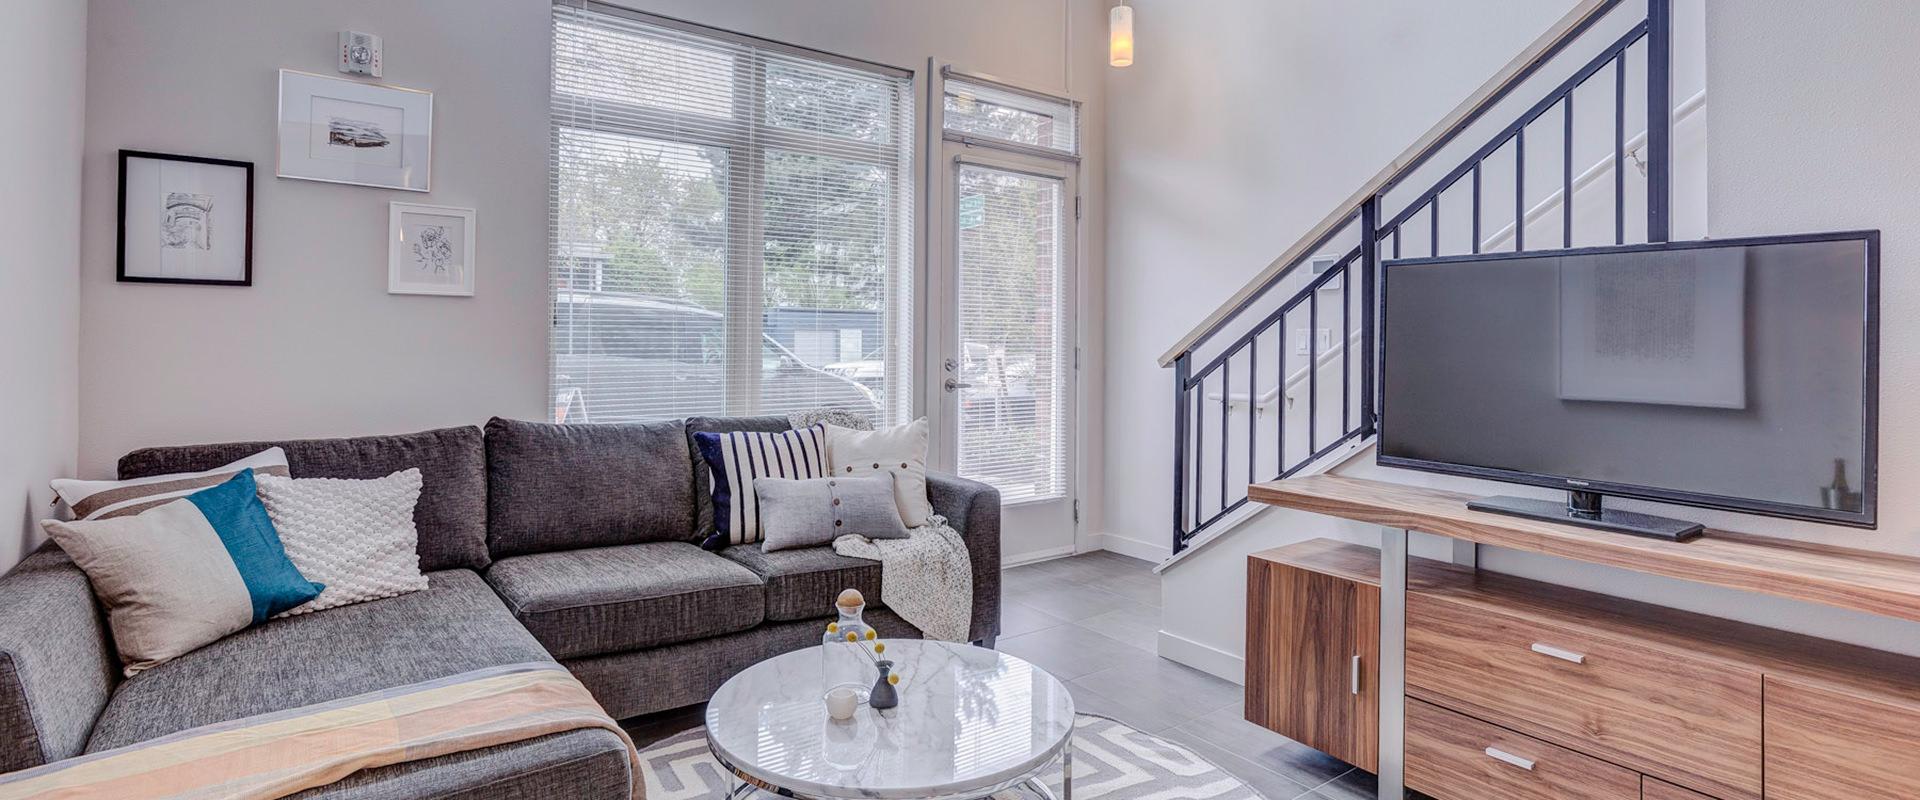 Latitude loft living room